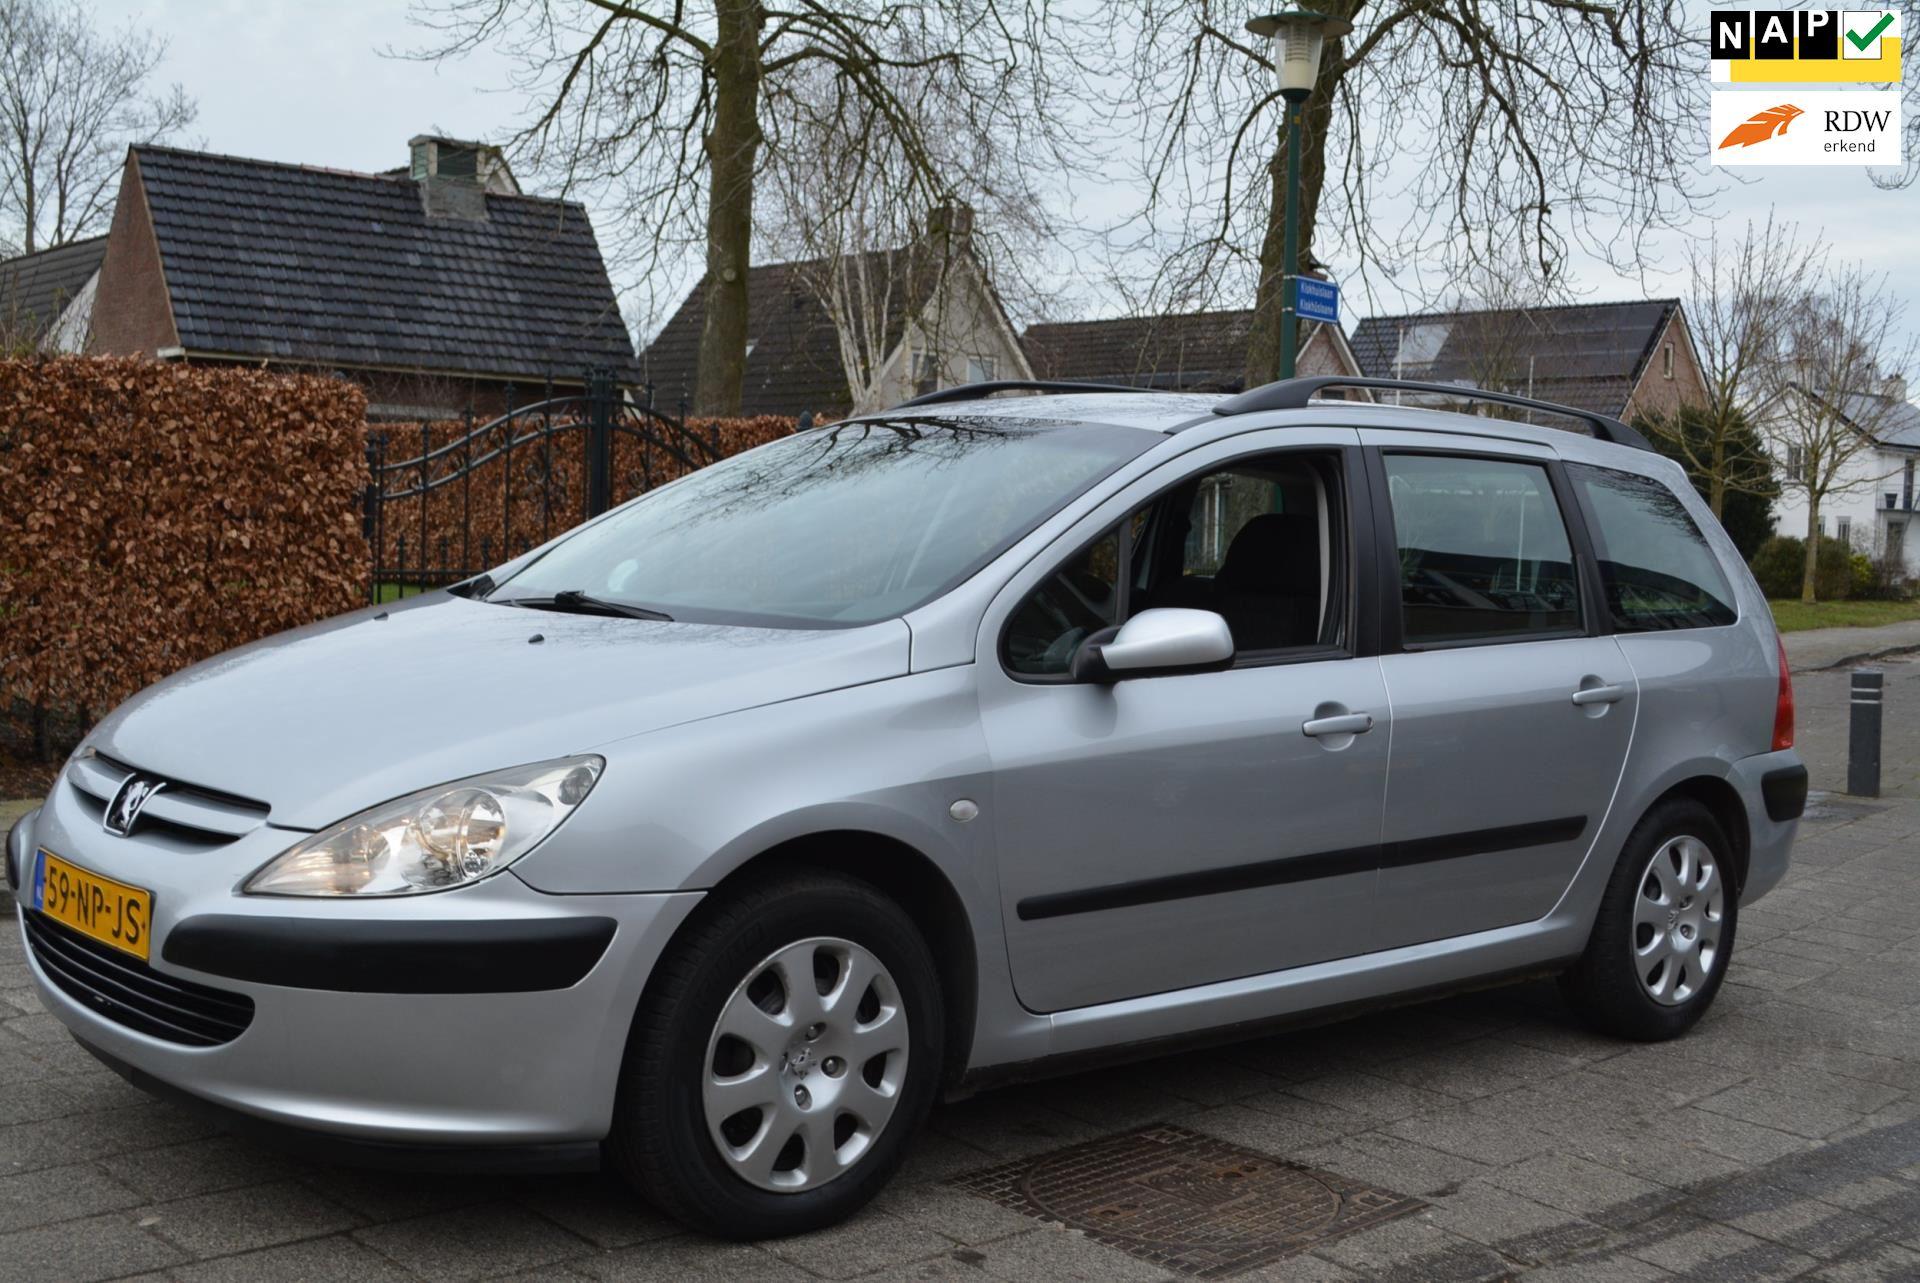 Peugeot 307 Break occasion - Autobedrijf Kiewiet (Auto 25)